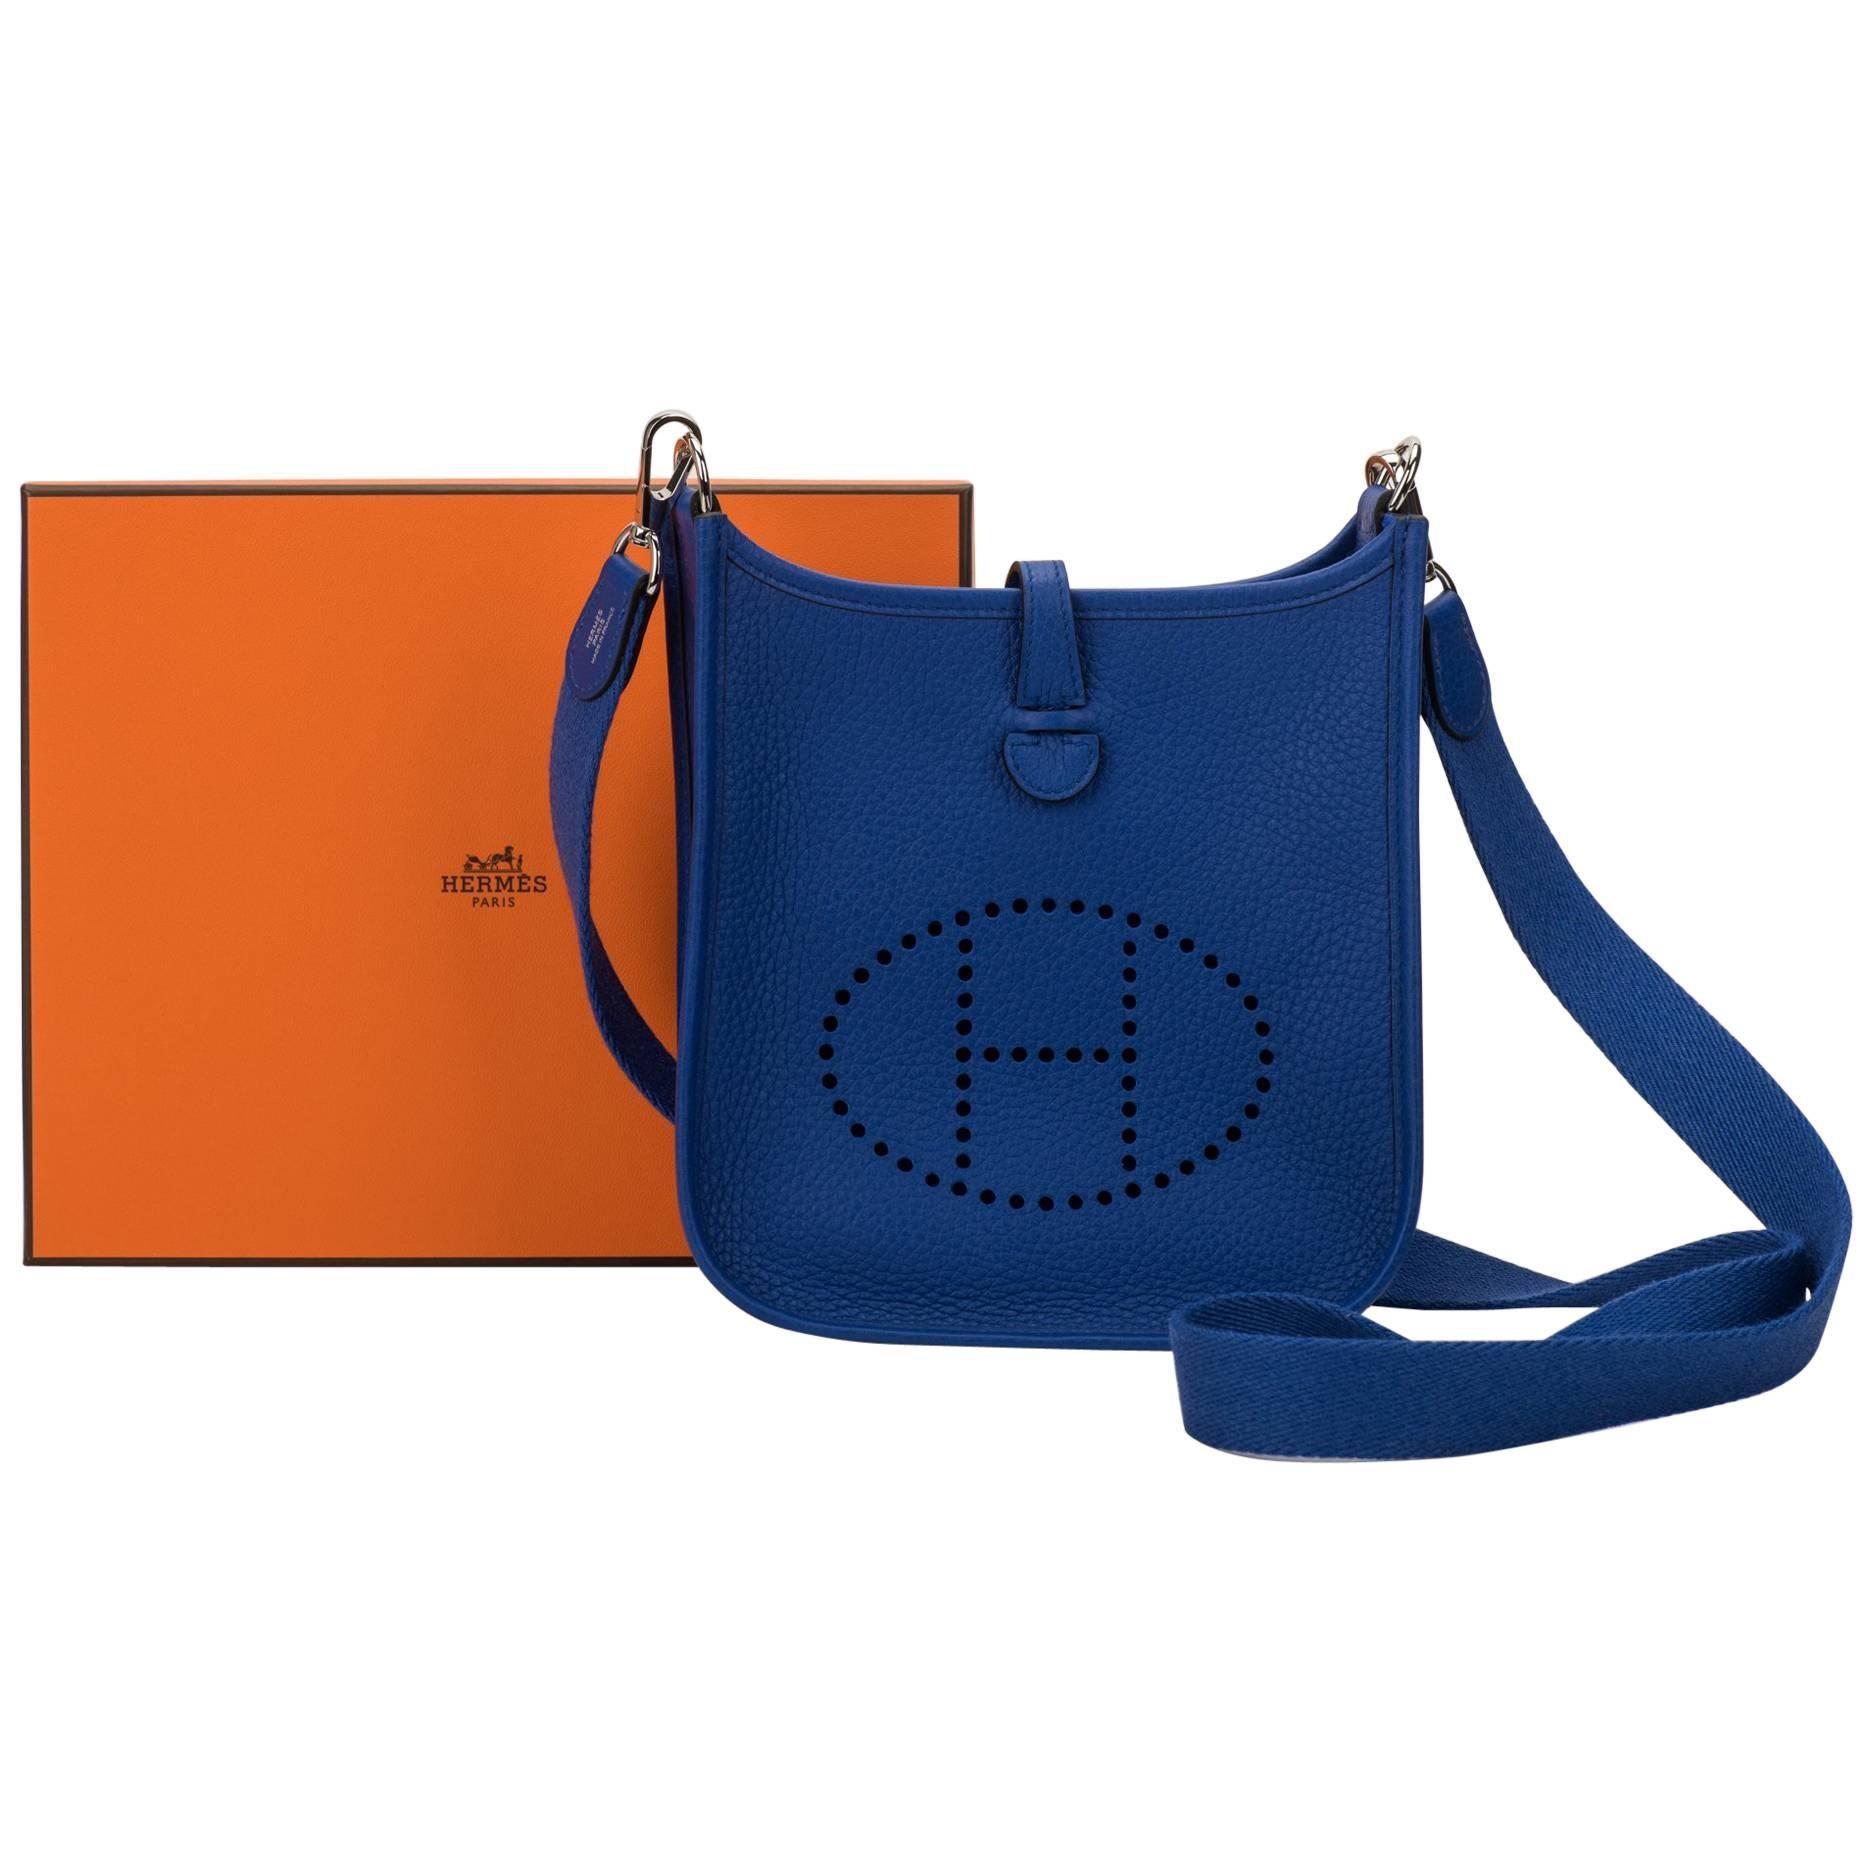 b529bfed7ac5 cheap hermes epsom evelyne b4410 018f5  low price new in box hermes  electric blue mini evelyne crossbody bag f79e0 f6670